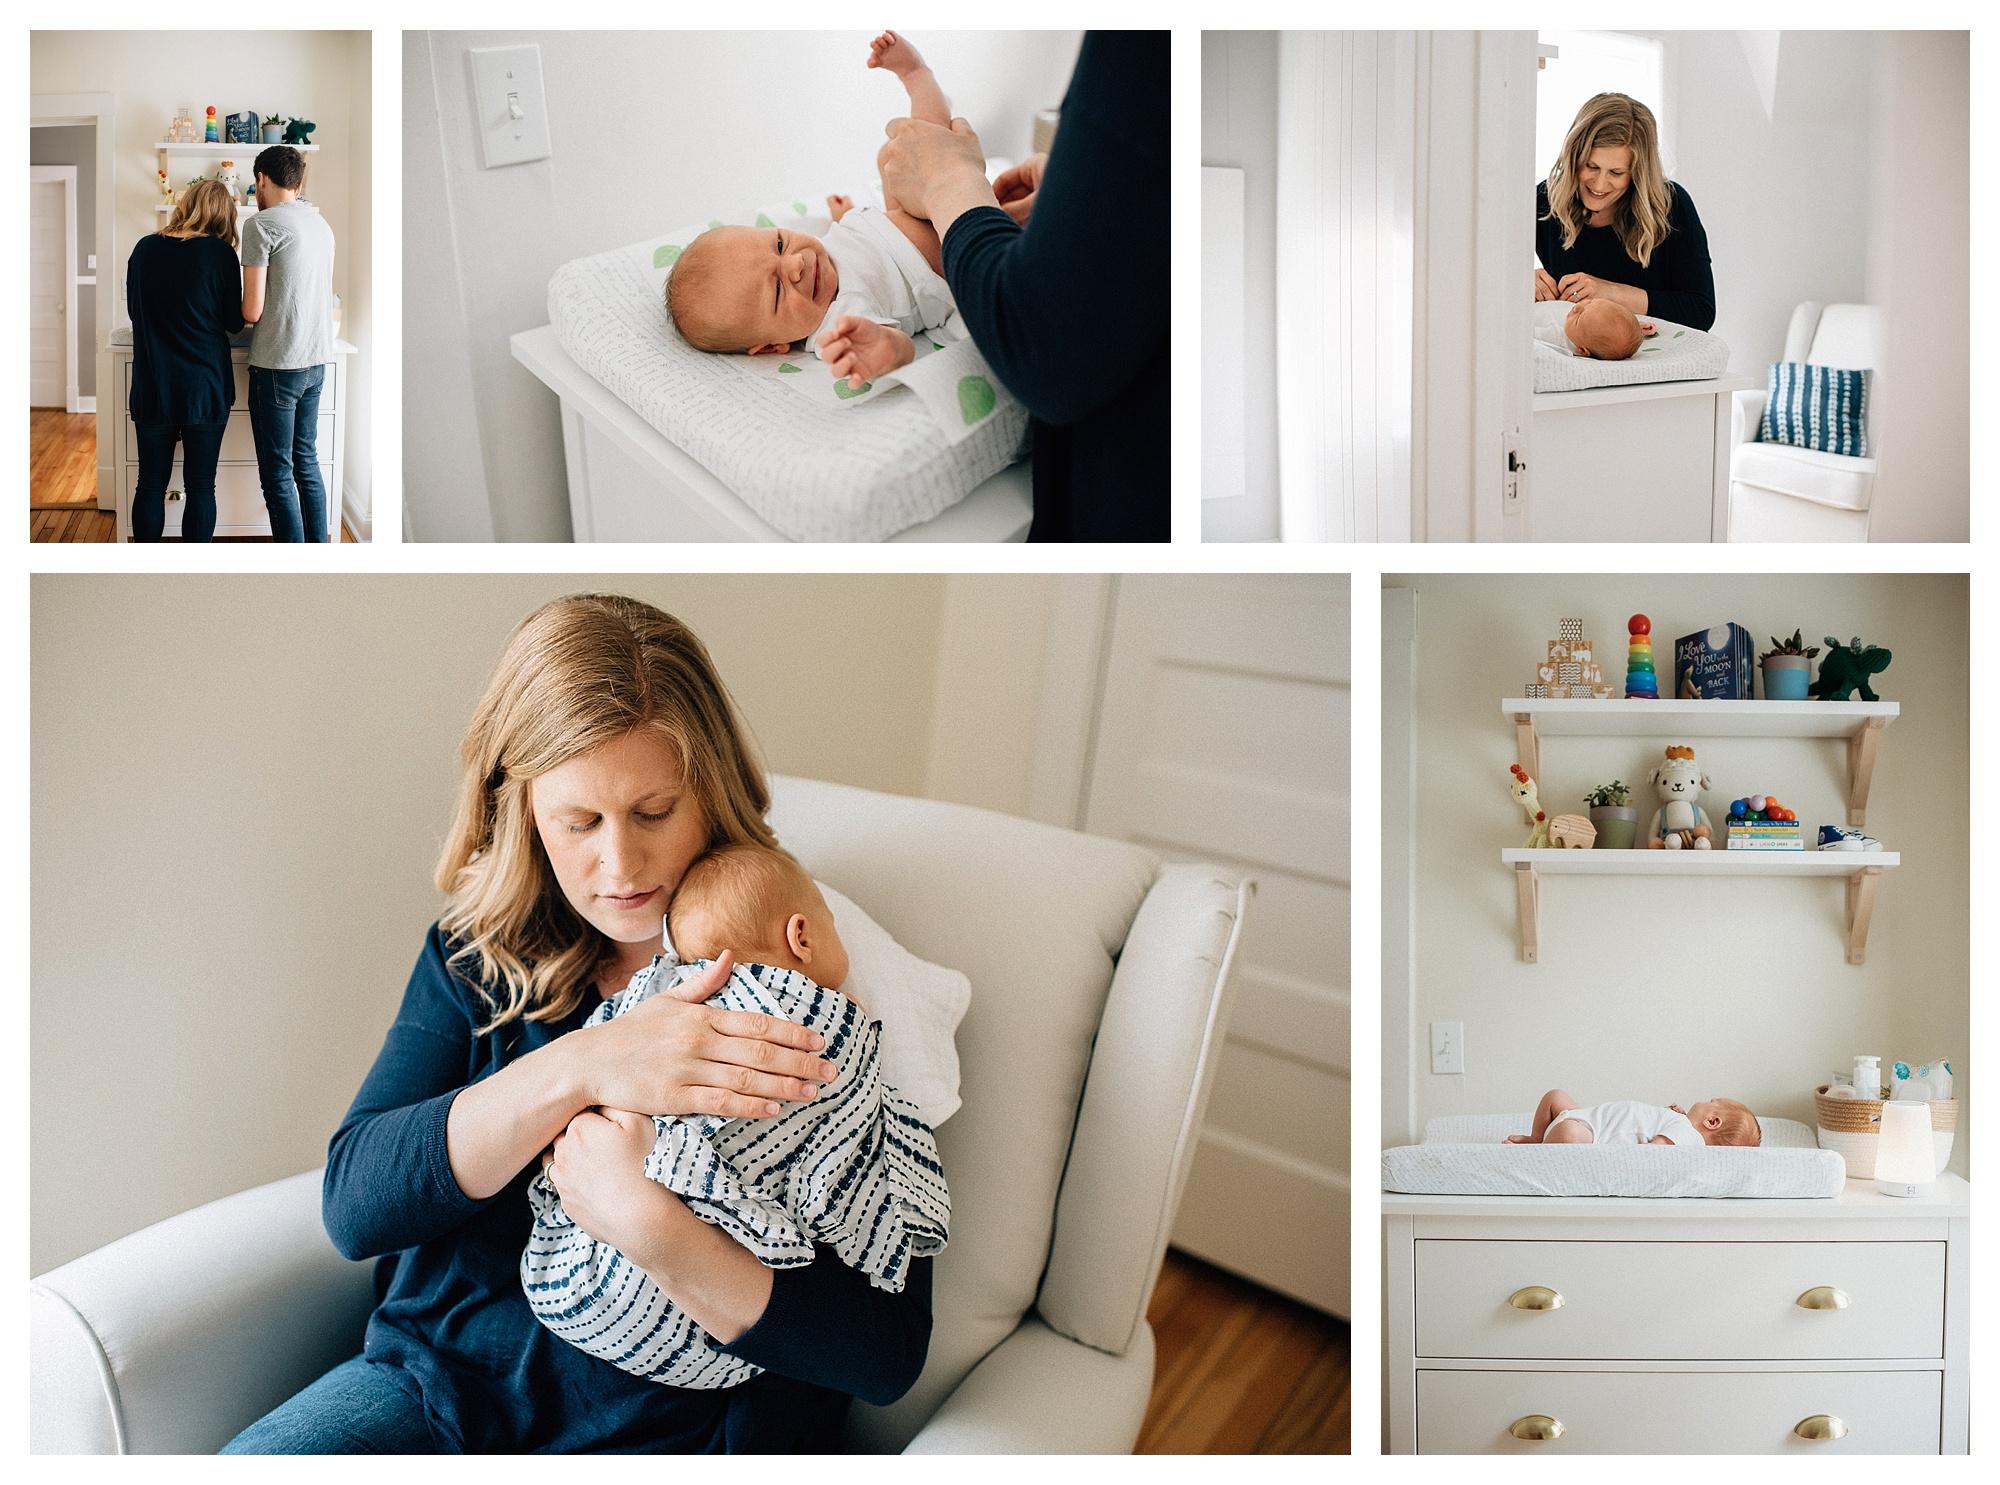 lake county newborn photographer, lifestyle photography, chicago phootgrapher, newborn, baby led, organic, bella nicole photography